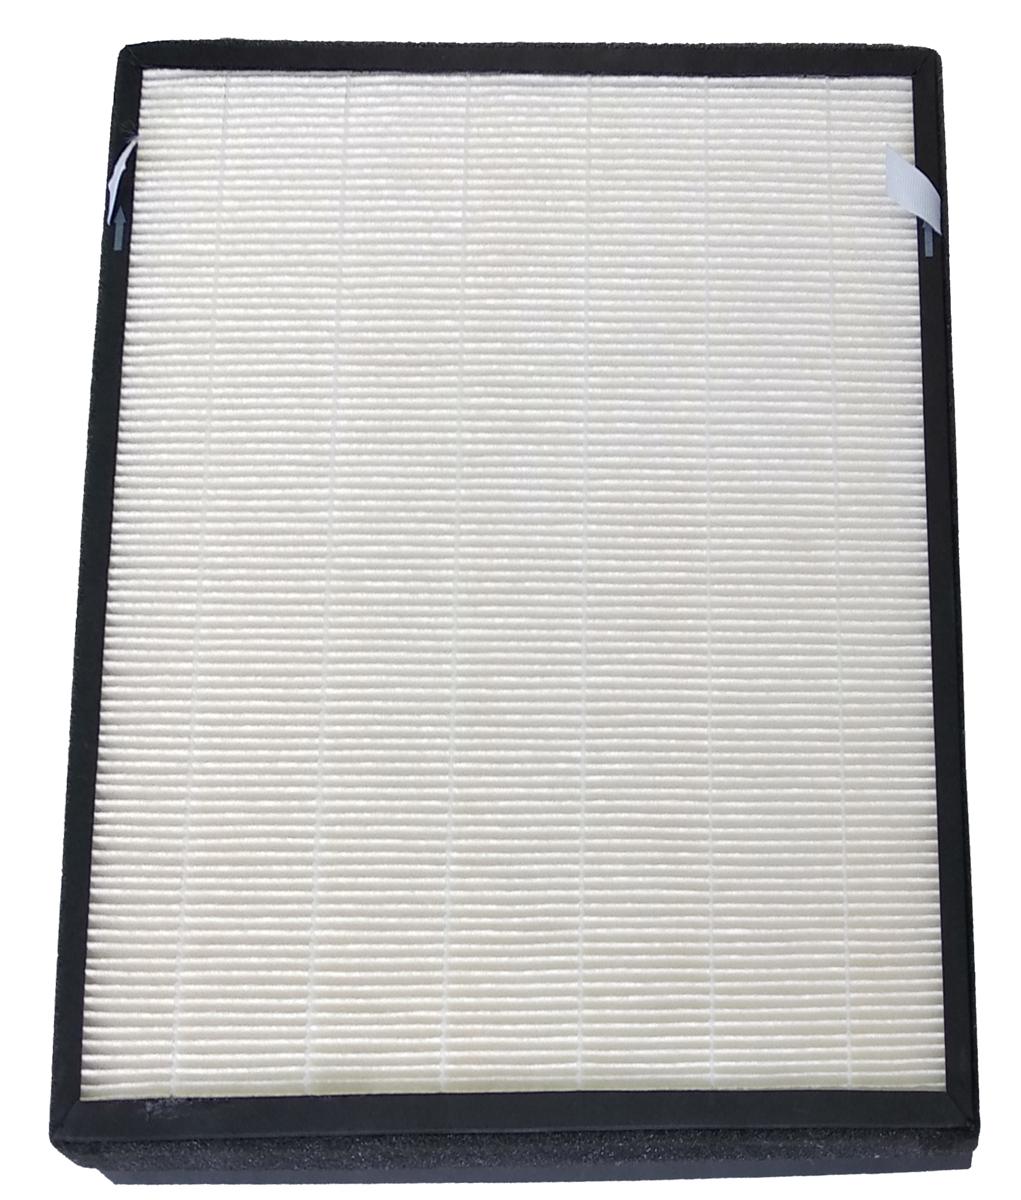 AIC фильтр для очистителя воздуха AIC XJ-4000 aic s040